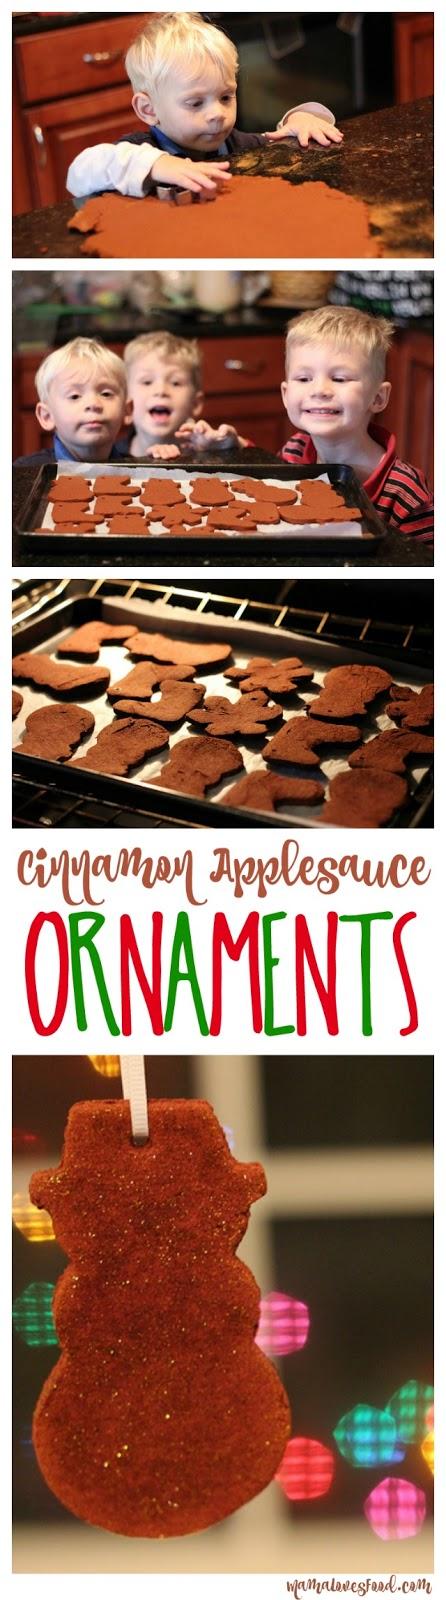 Cinnamon Applesauce Holiday Ornaments